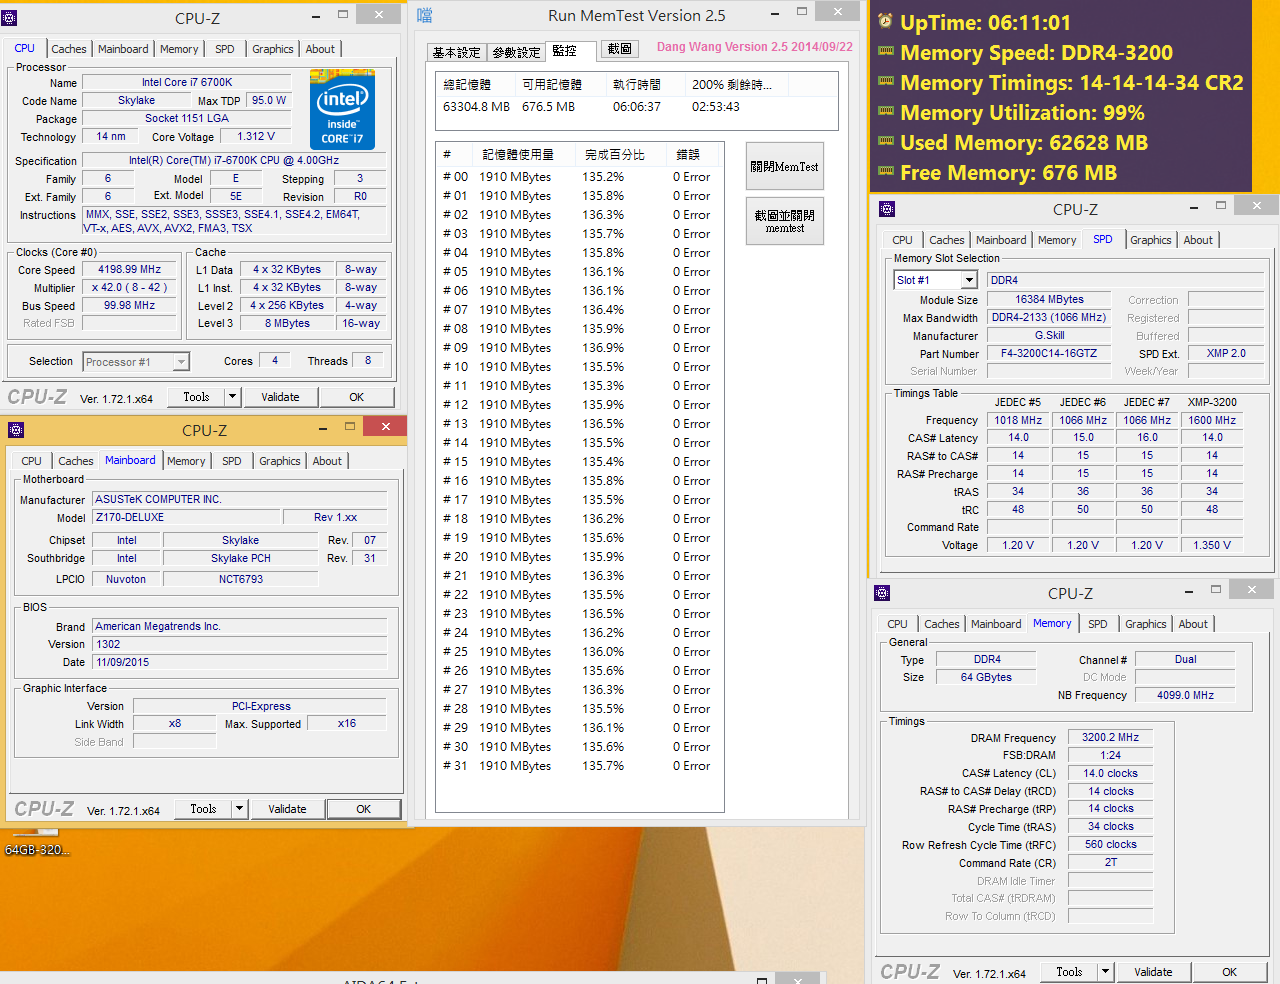 G SKILL Announces DDR4-3200MHz CL14 64GB(4x16GB) Memory Kit